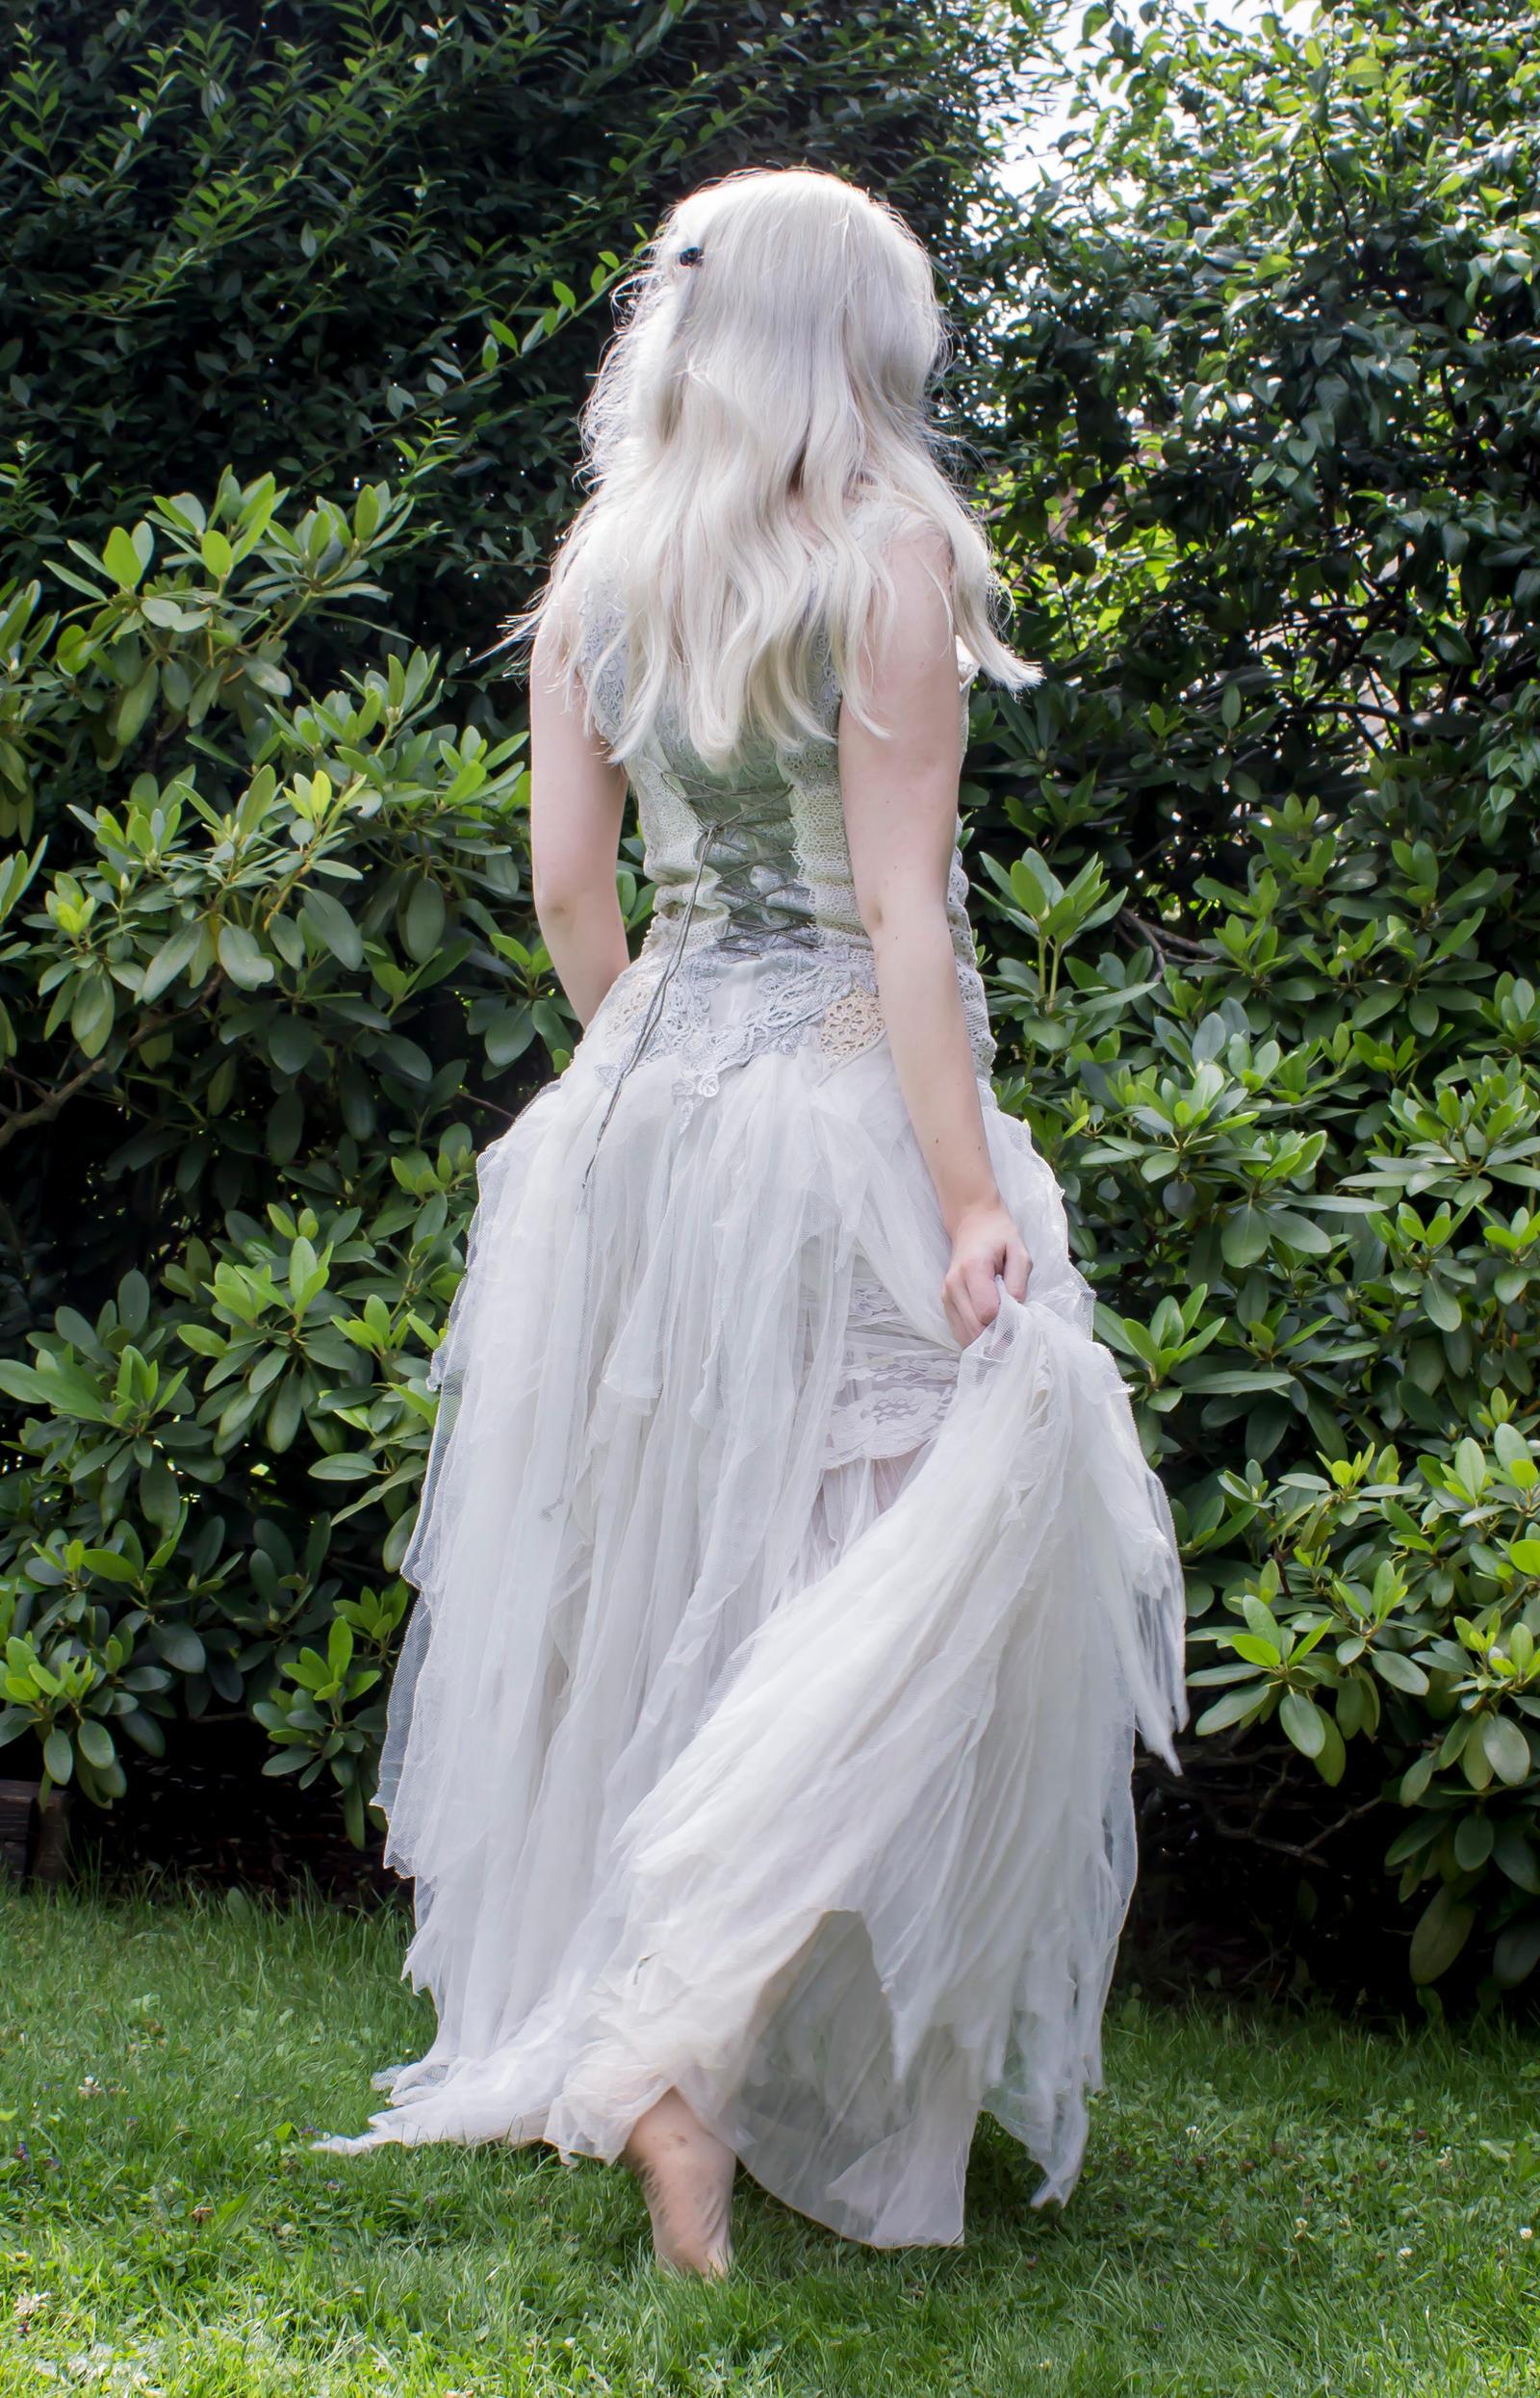 White dress by Liancary-art